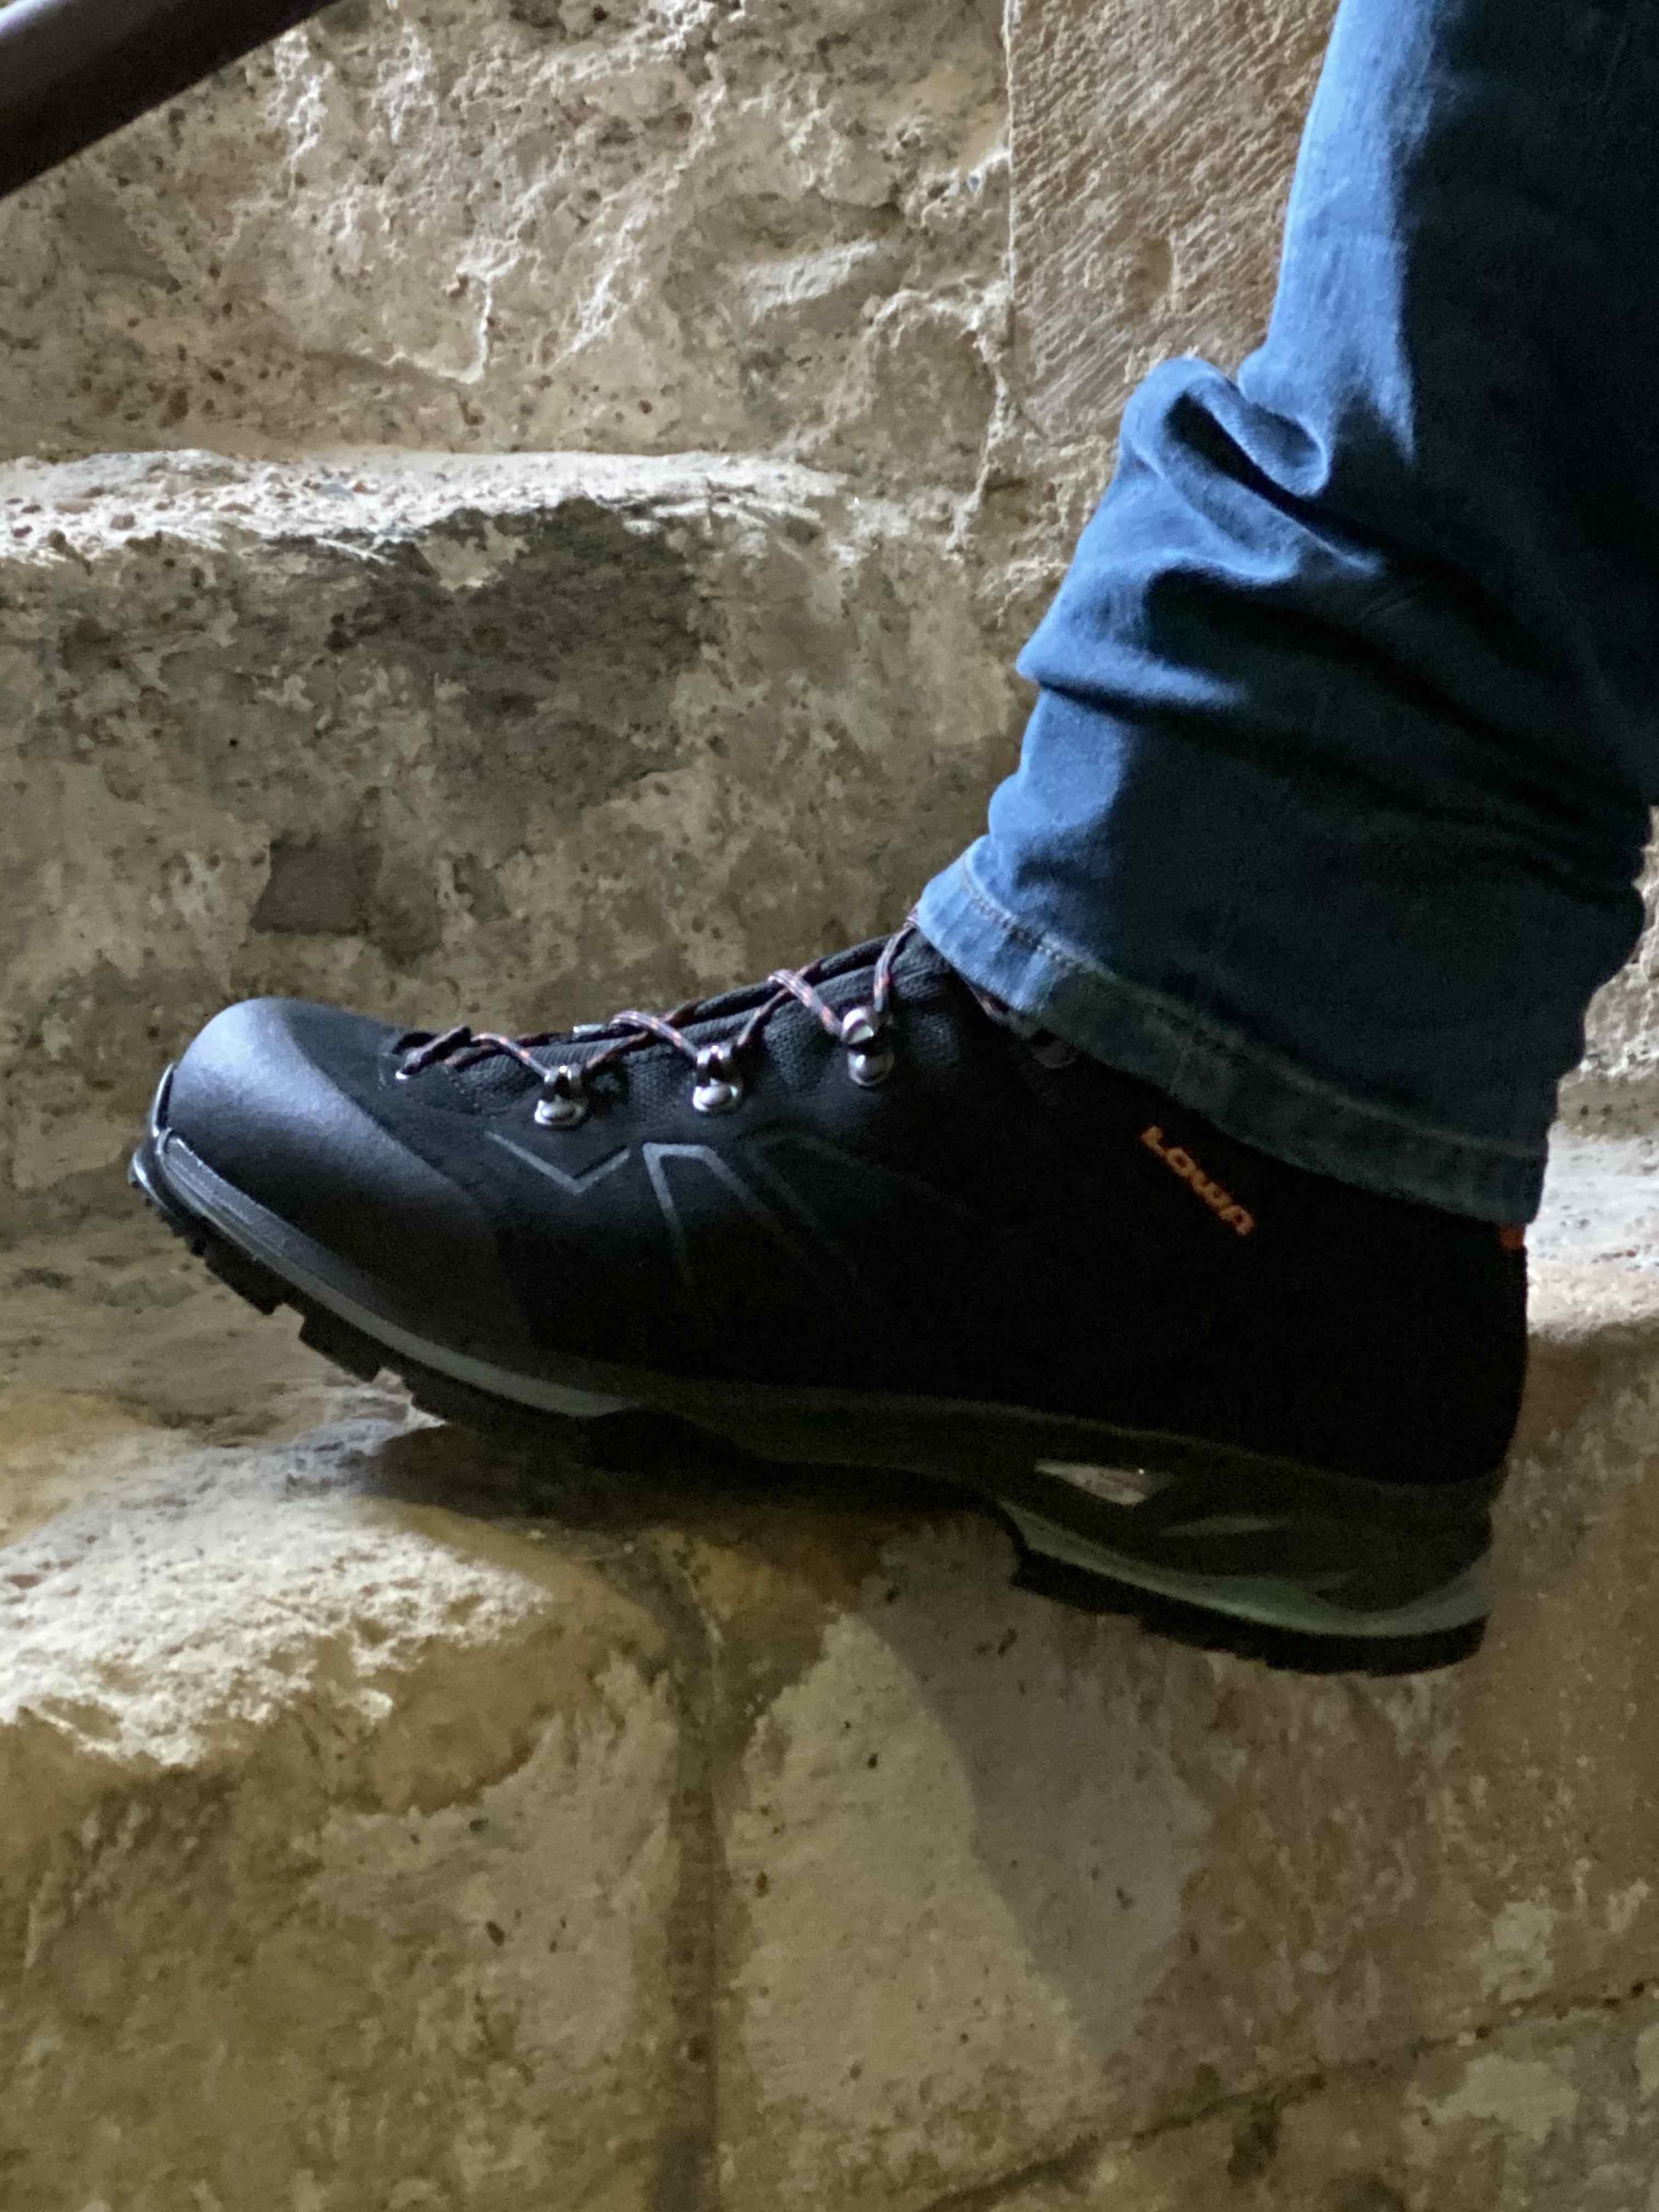 LOWA BALDO GTX MENS WALKING BOOTS